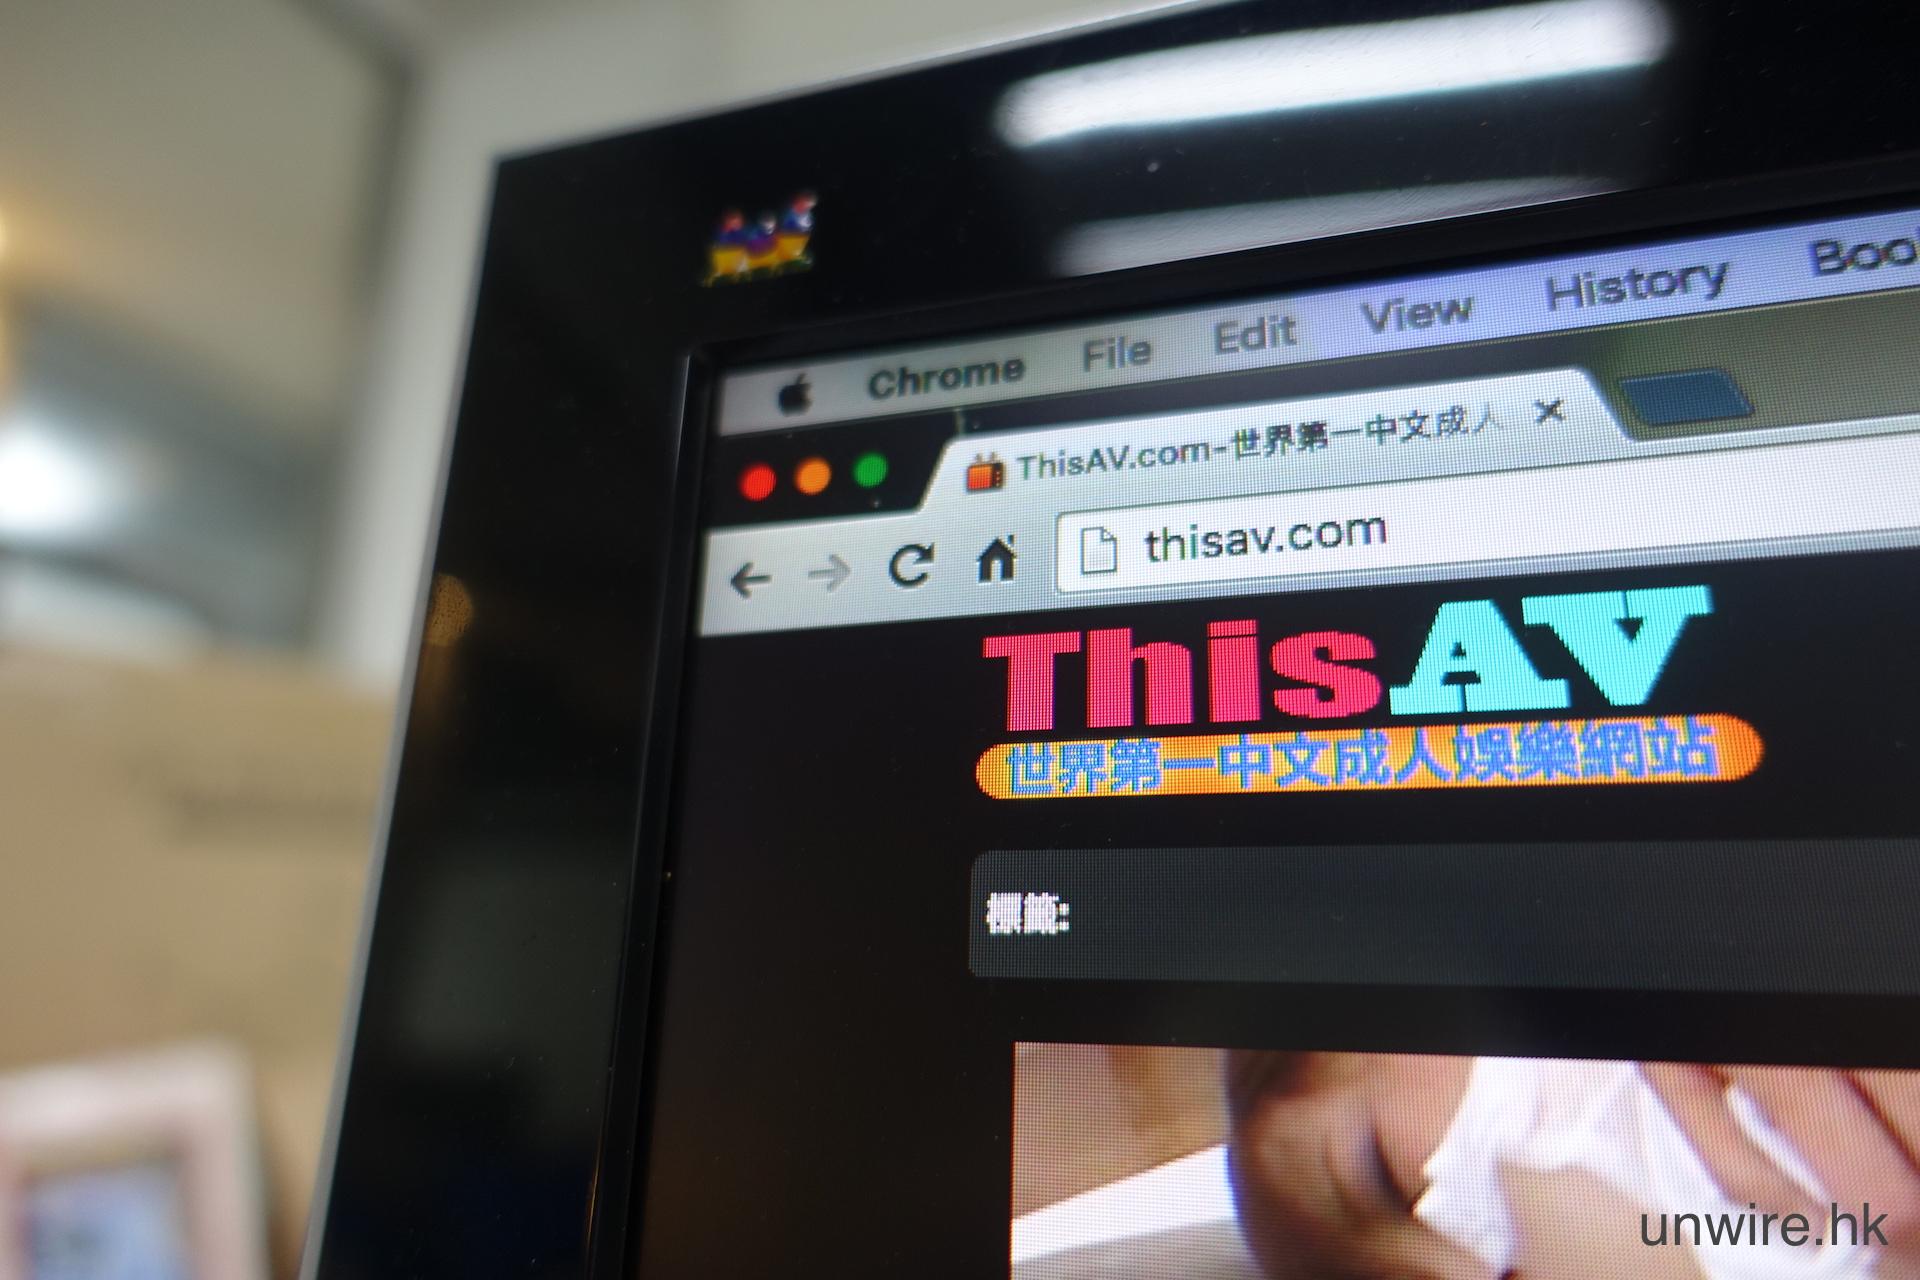 ThisAV 專訪 !解開「技術」問題 - 用 Flash 唔轉 HTML5 ? 低清 ? 無 iOS APP